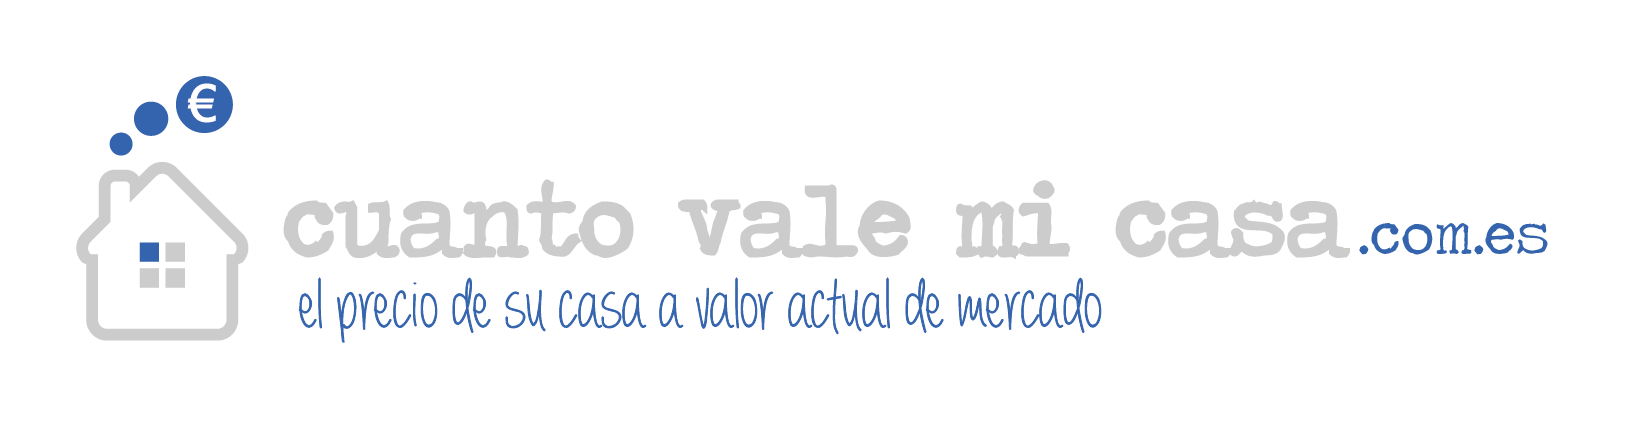 cuantovalemicasa-logo-transp-72-05